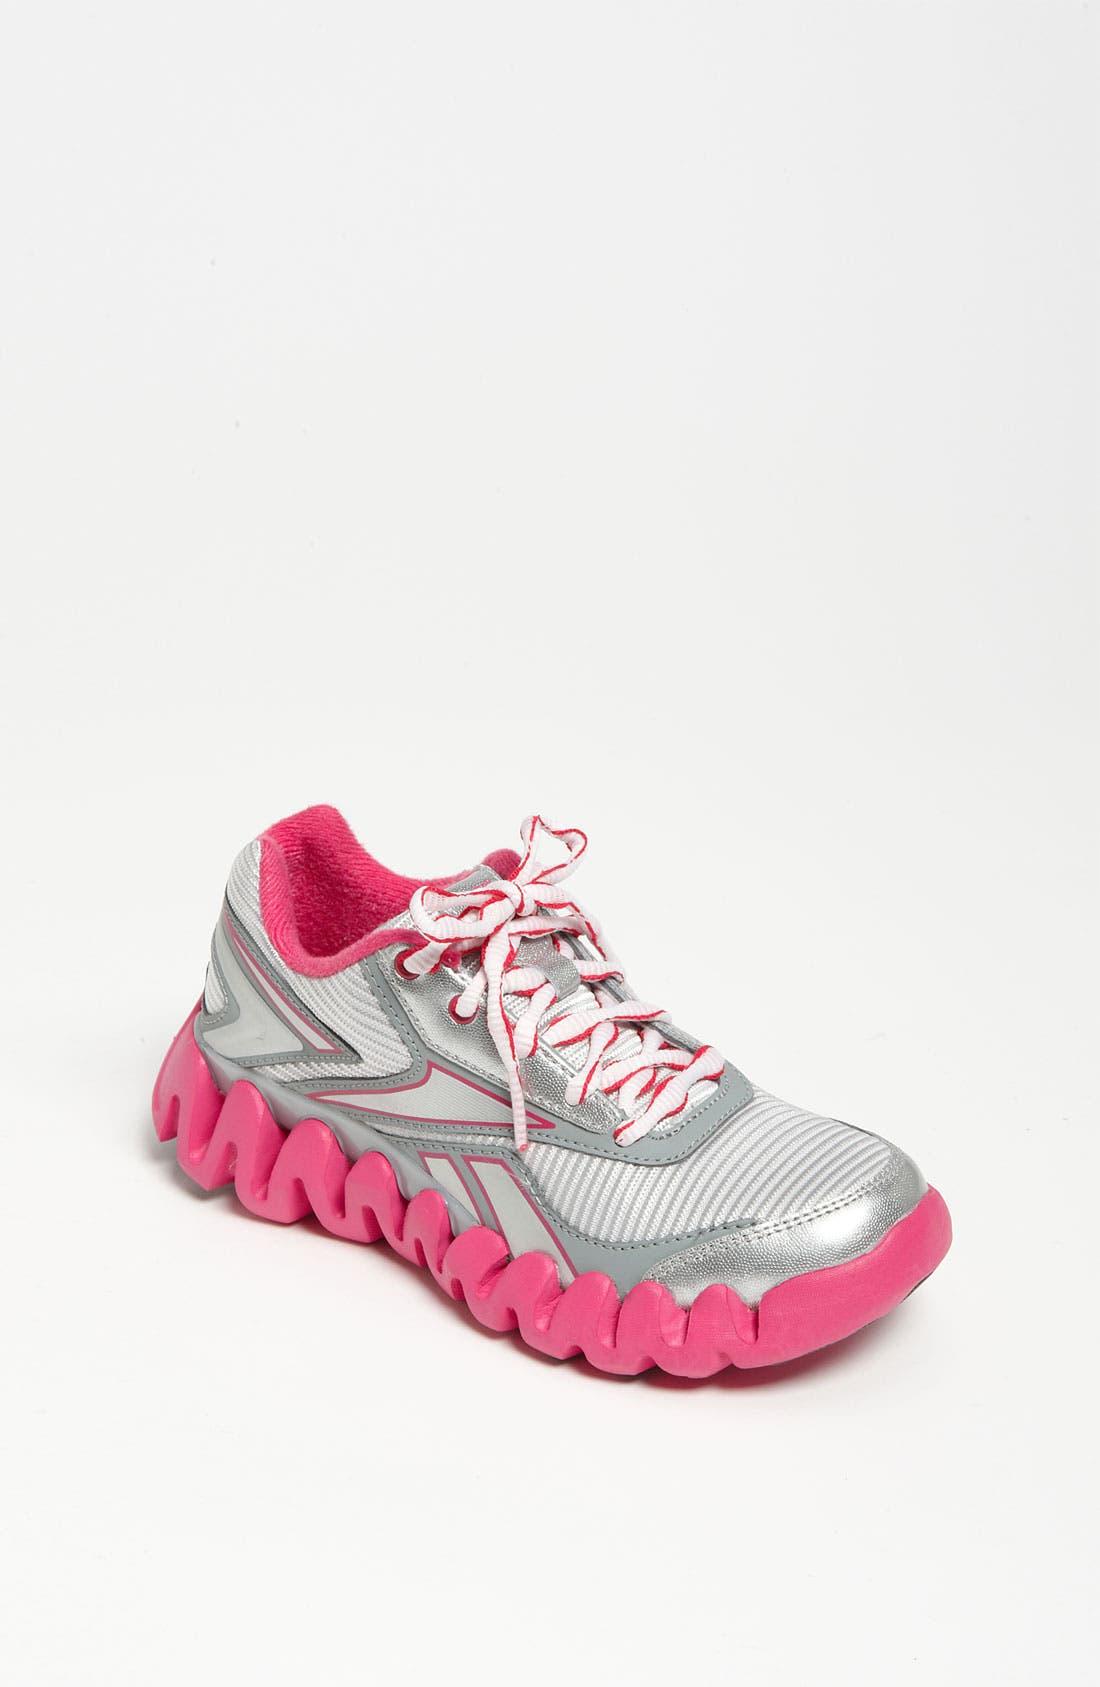 Alternate Image 1 Selected - Reebok 'ZigActivate' Running Shoe (Little Kid & Big Kid)